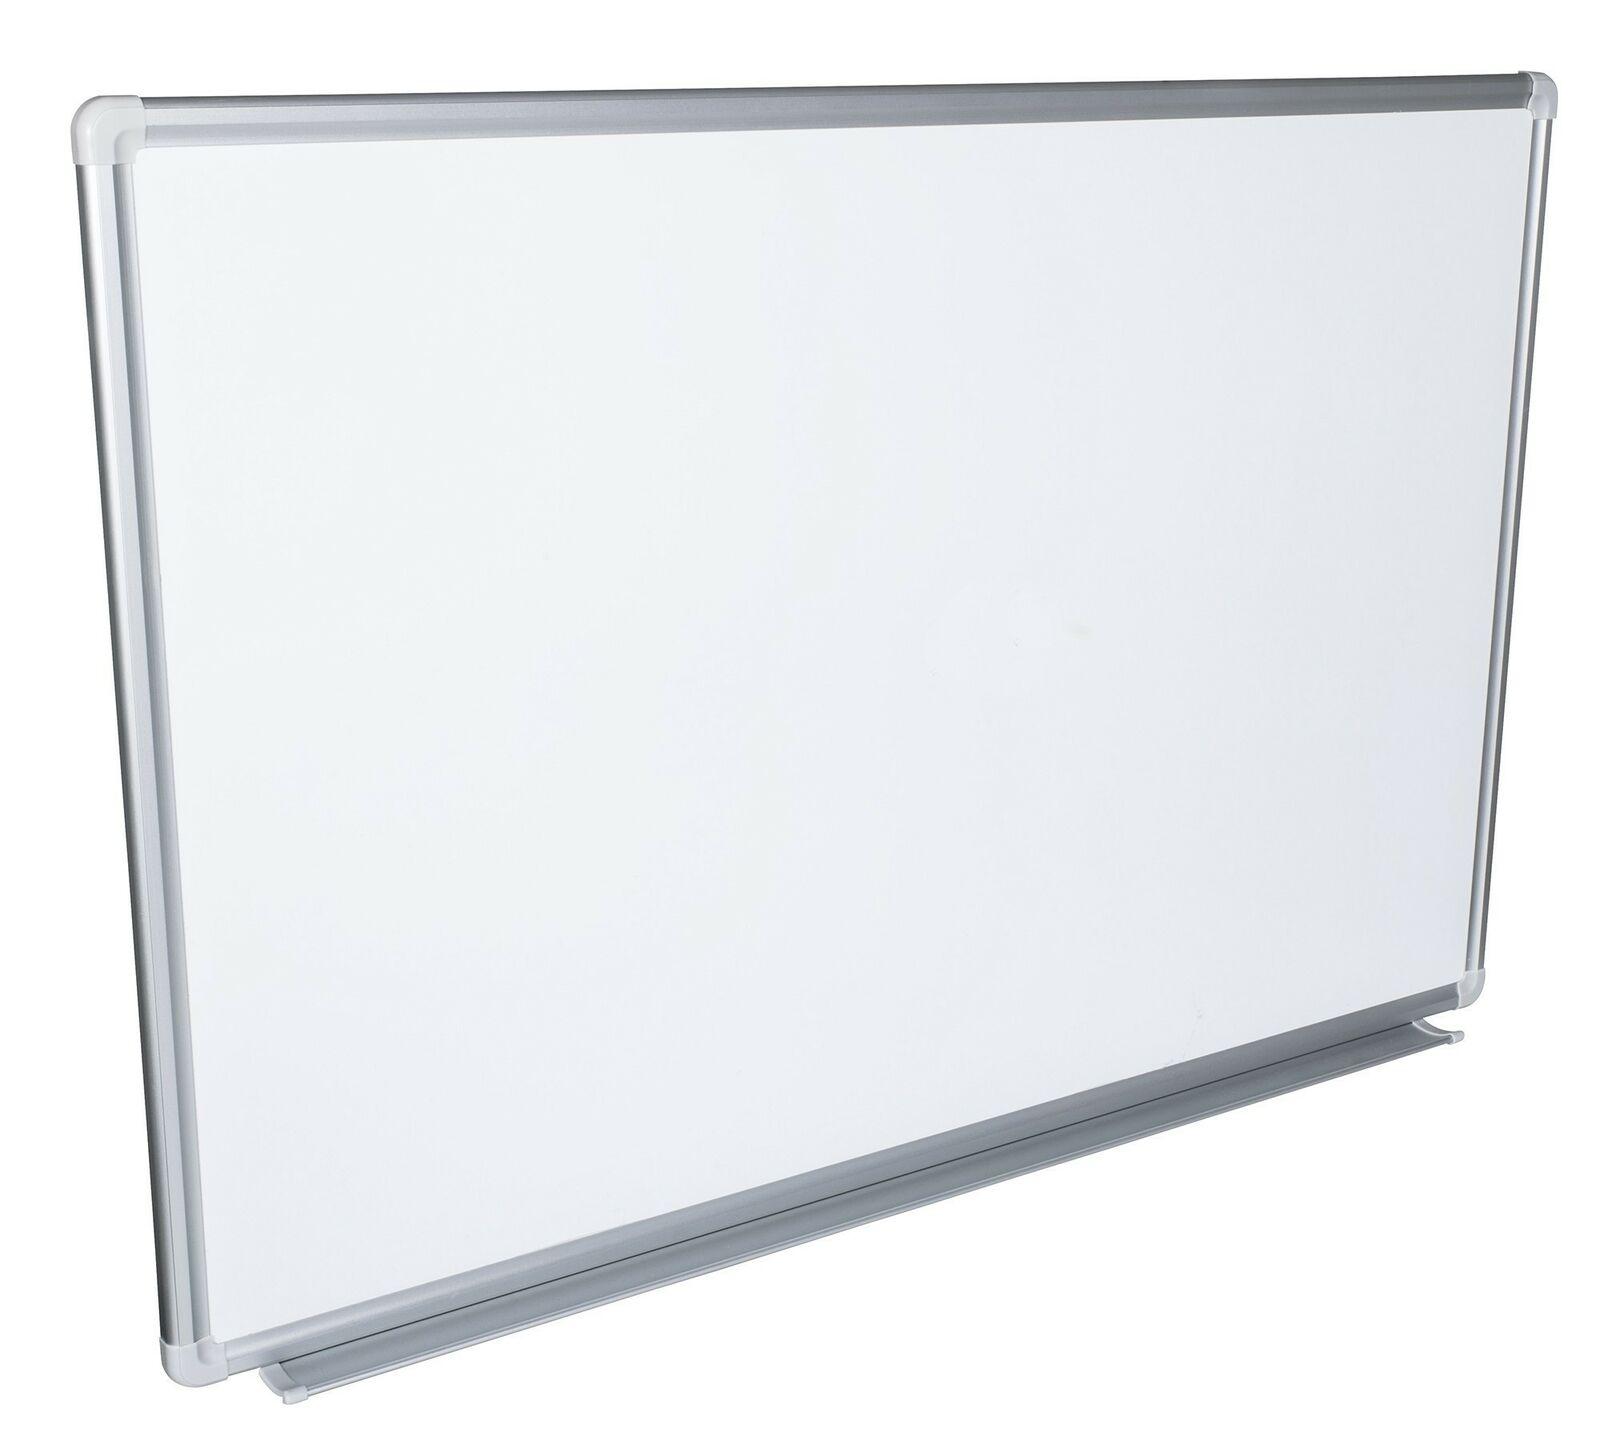 12 Magnete Präsentationstafel 607355 Whiteboard Magnettafel Wandtafel 90x120 cm